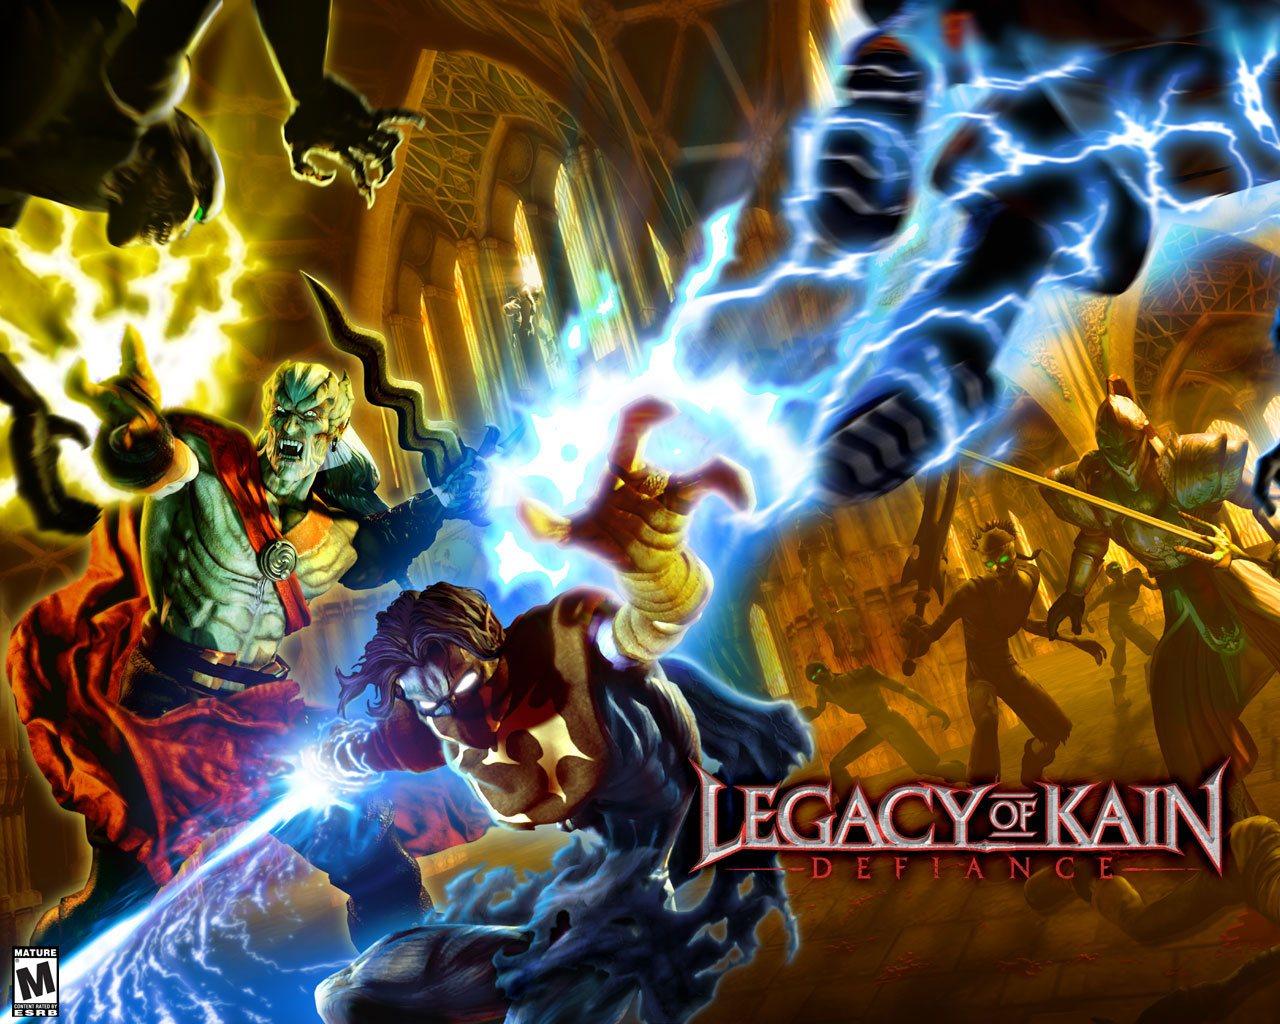 Guía de Legacy of Kain: Defiance